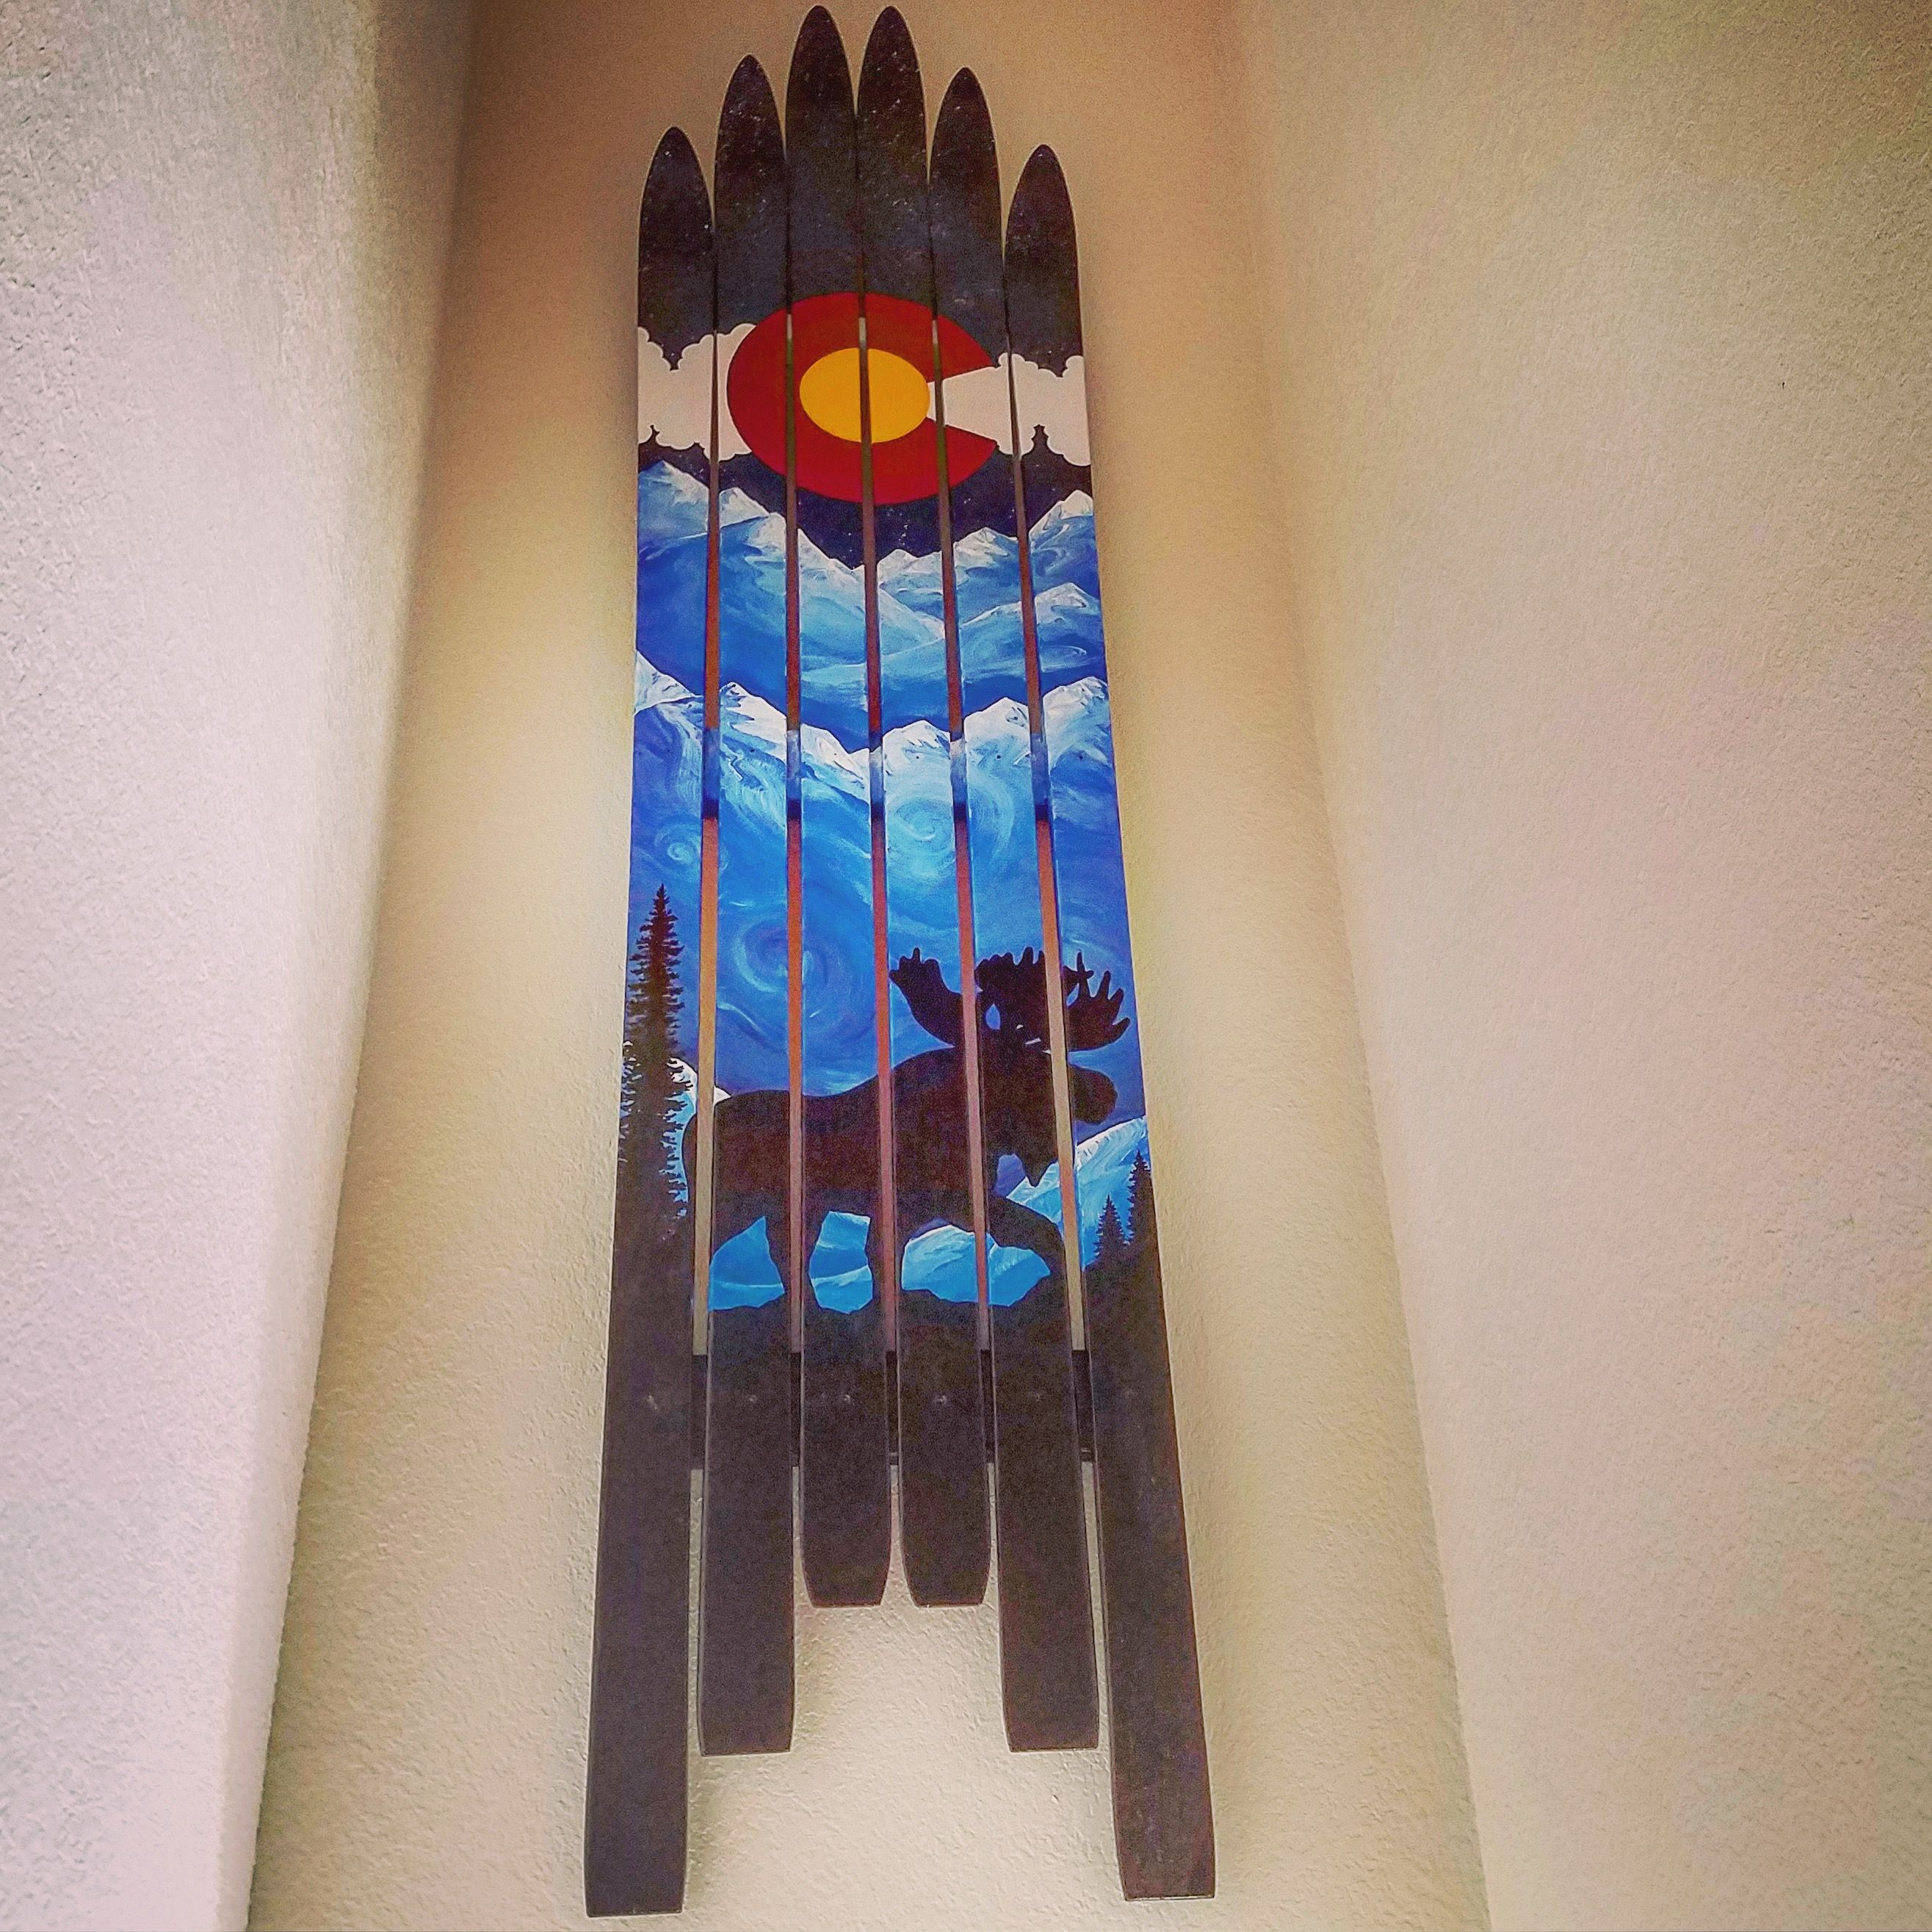 Pin By Colorado Ski Furniture On Made In Colorado Rad Stuff Colorado Art Barnwood Wall Art Wall Flag